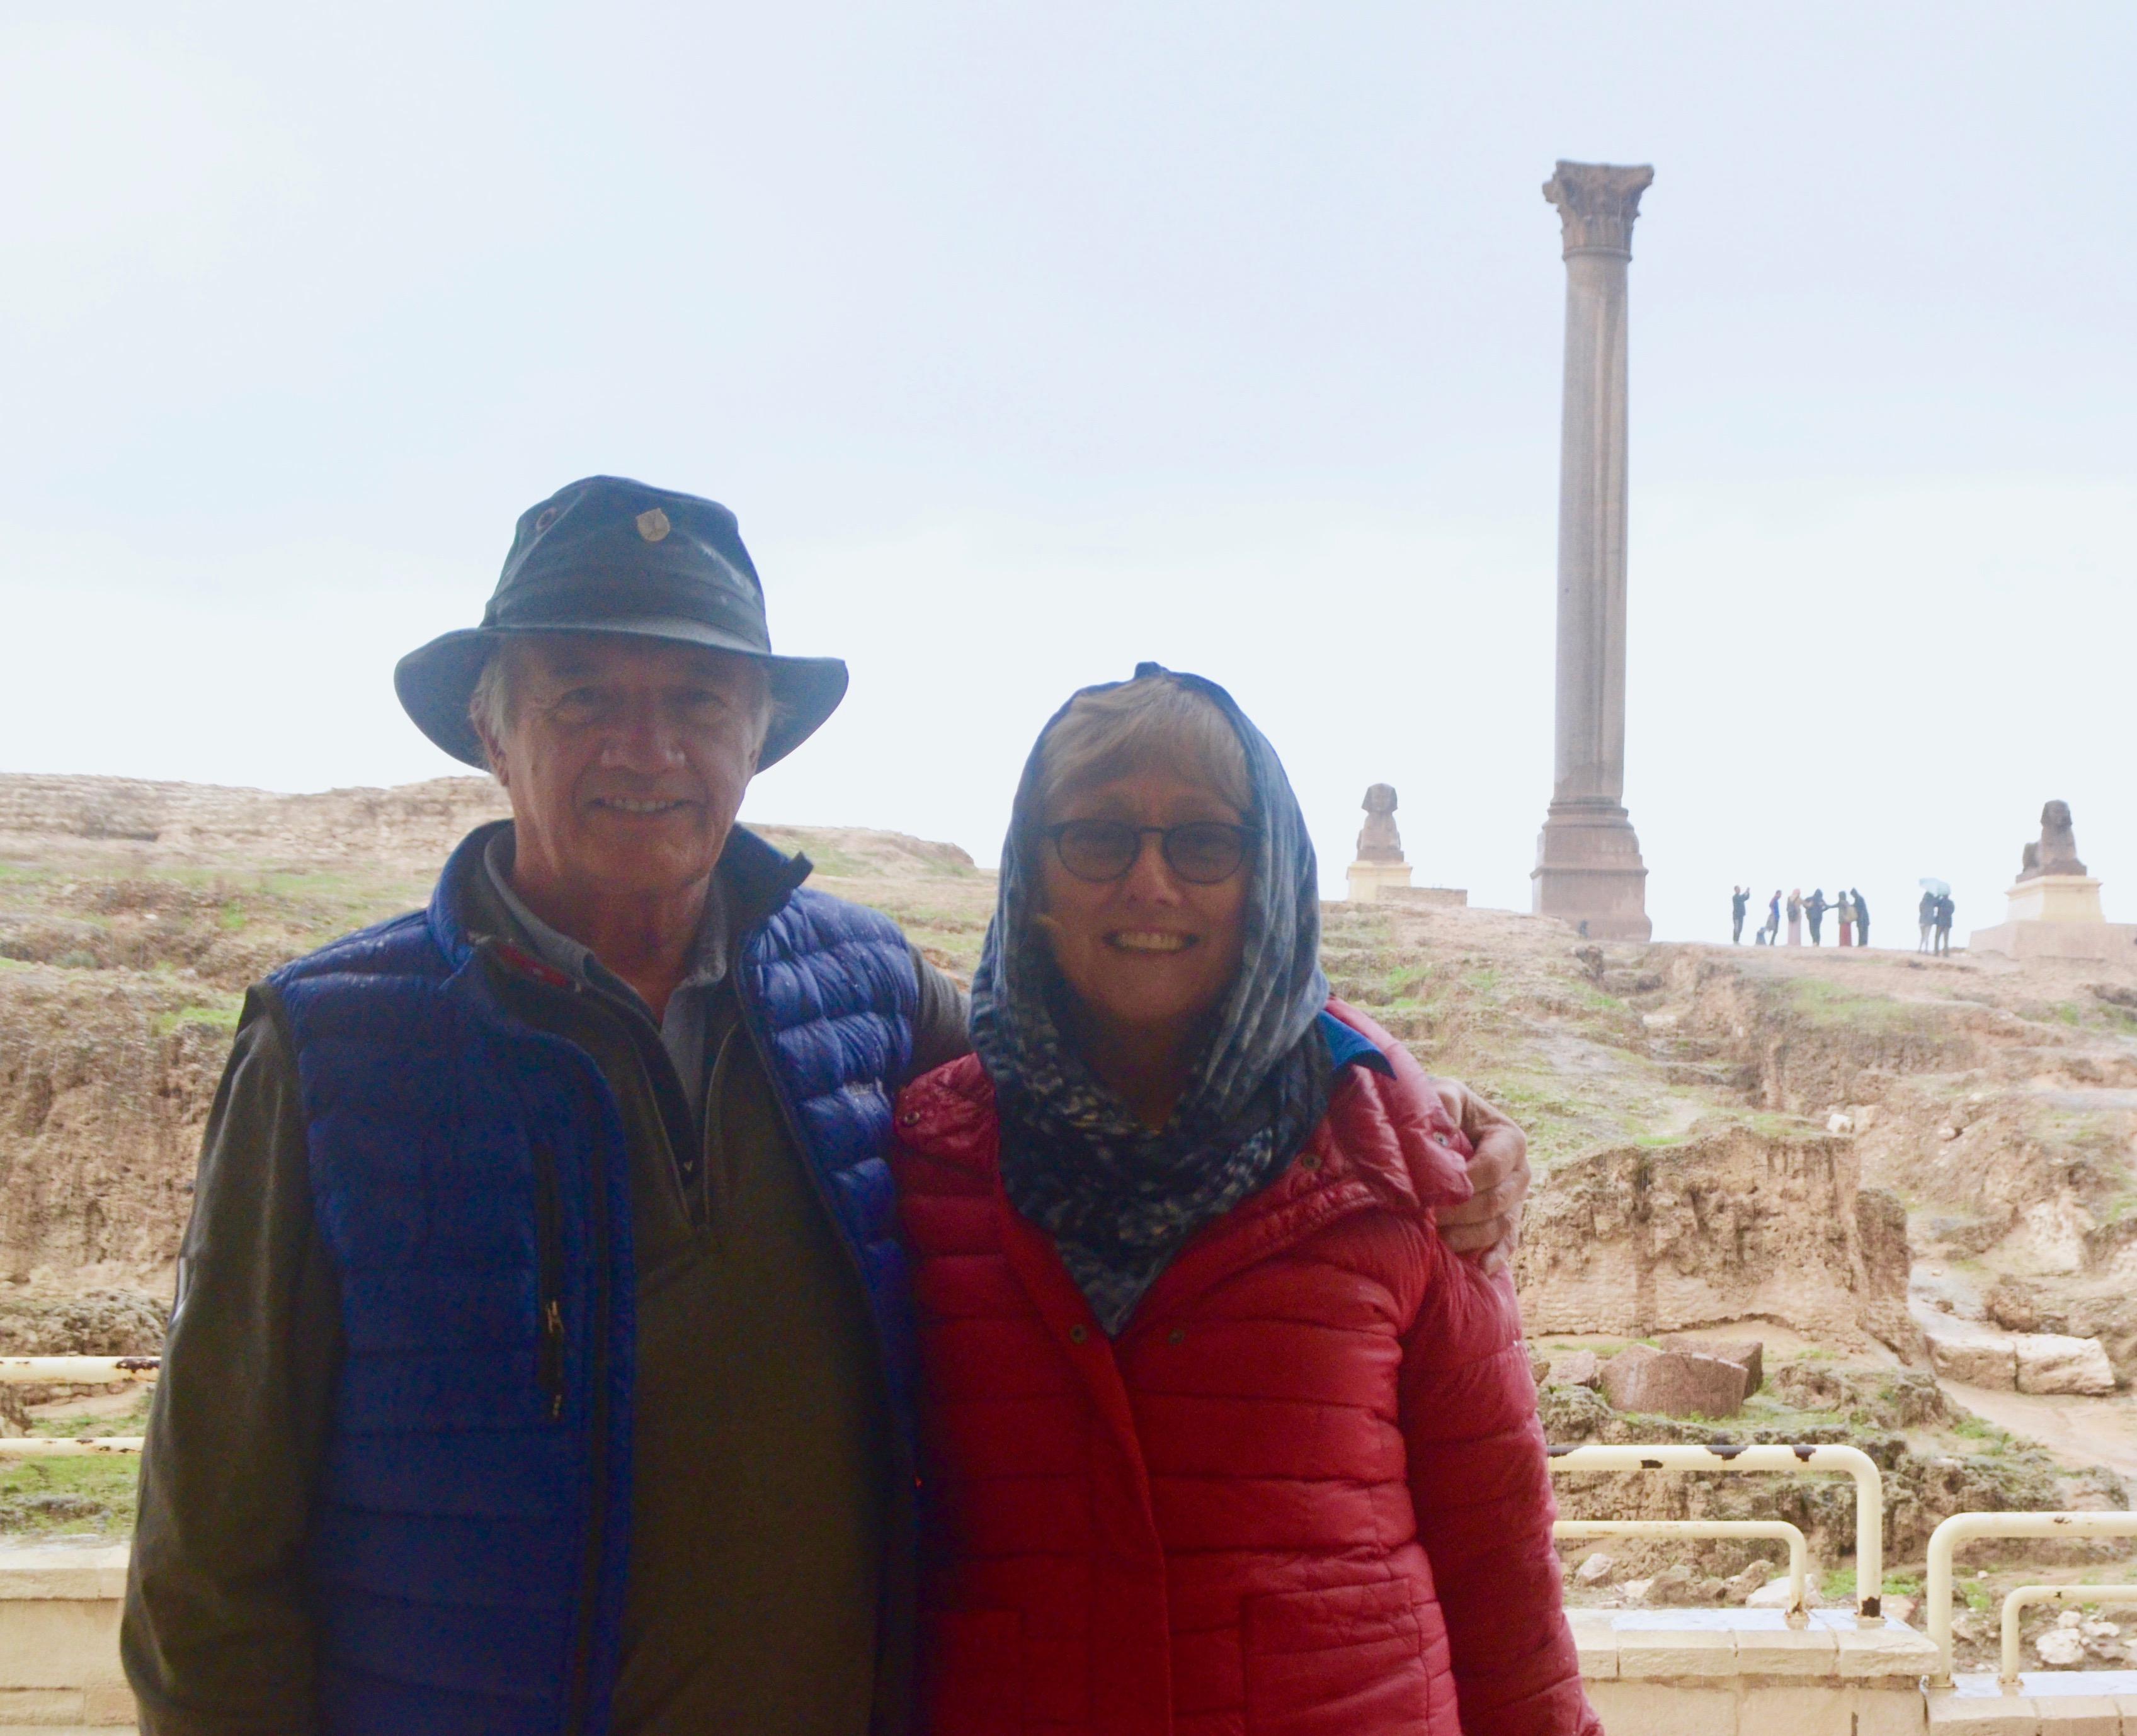 At Pompey's Pillar